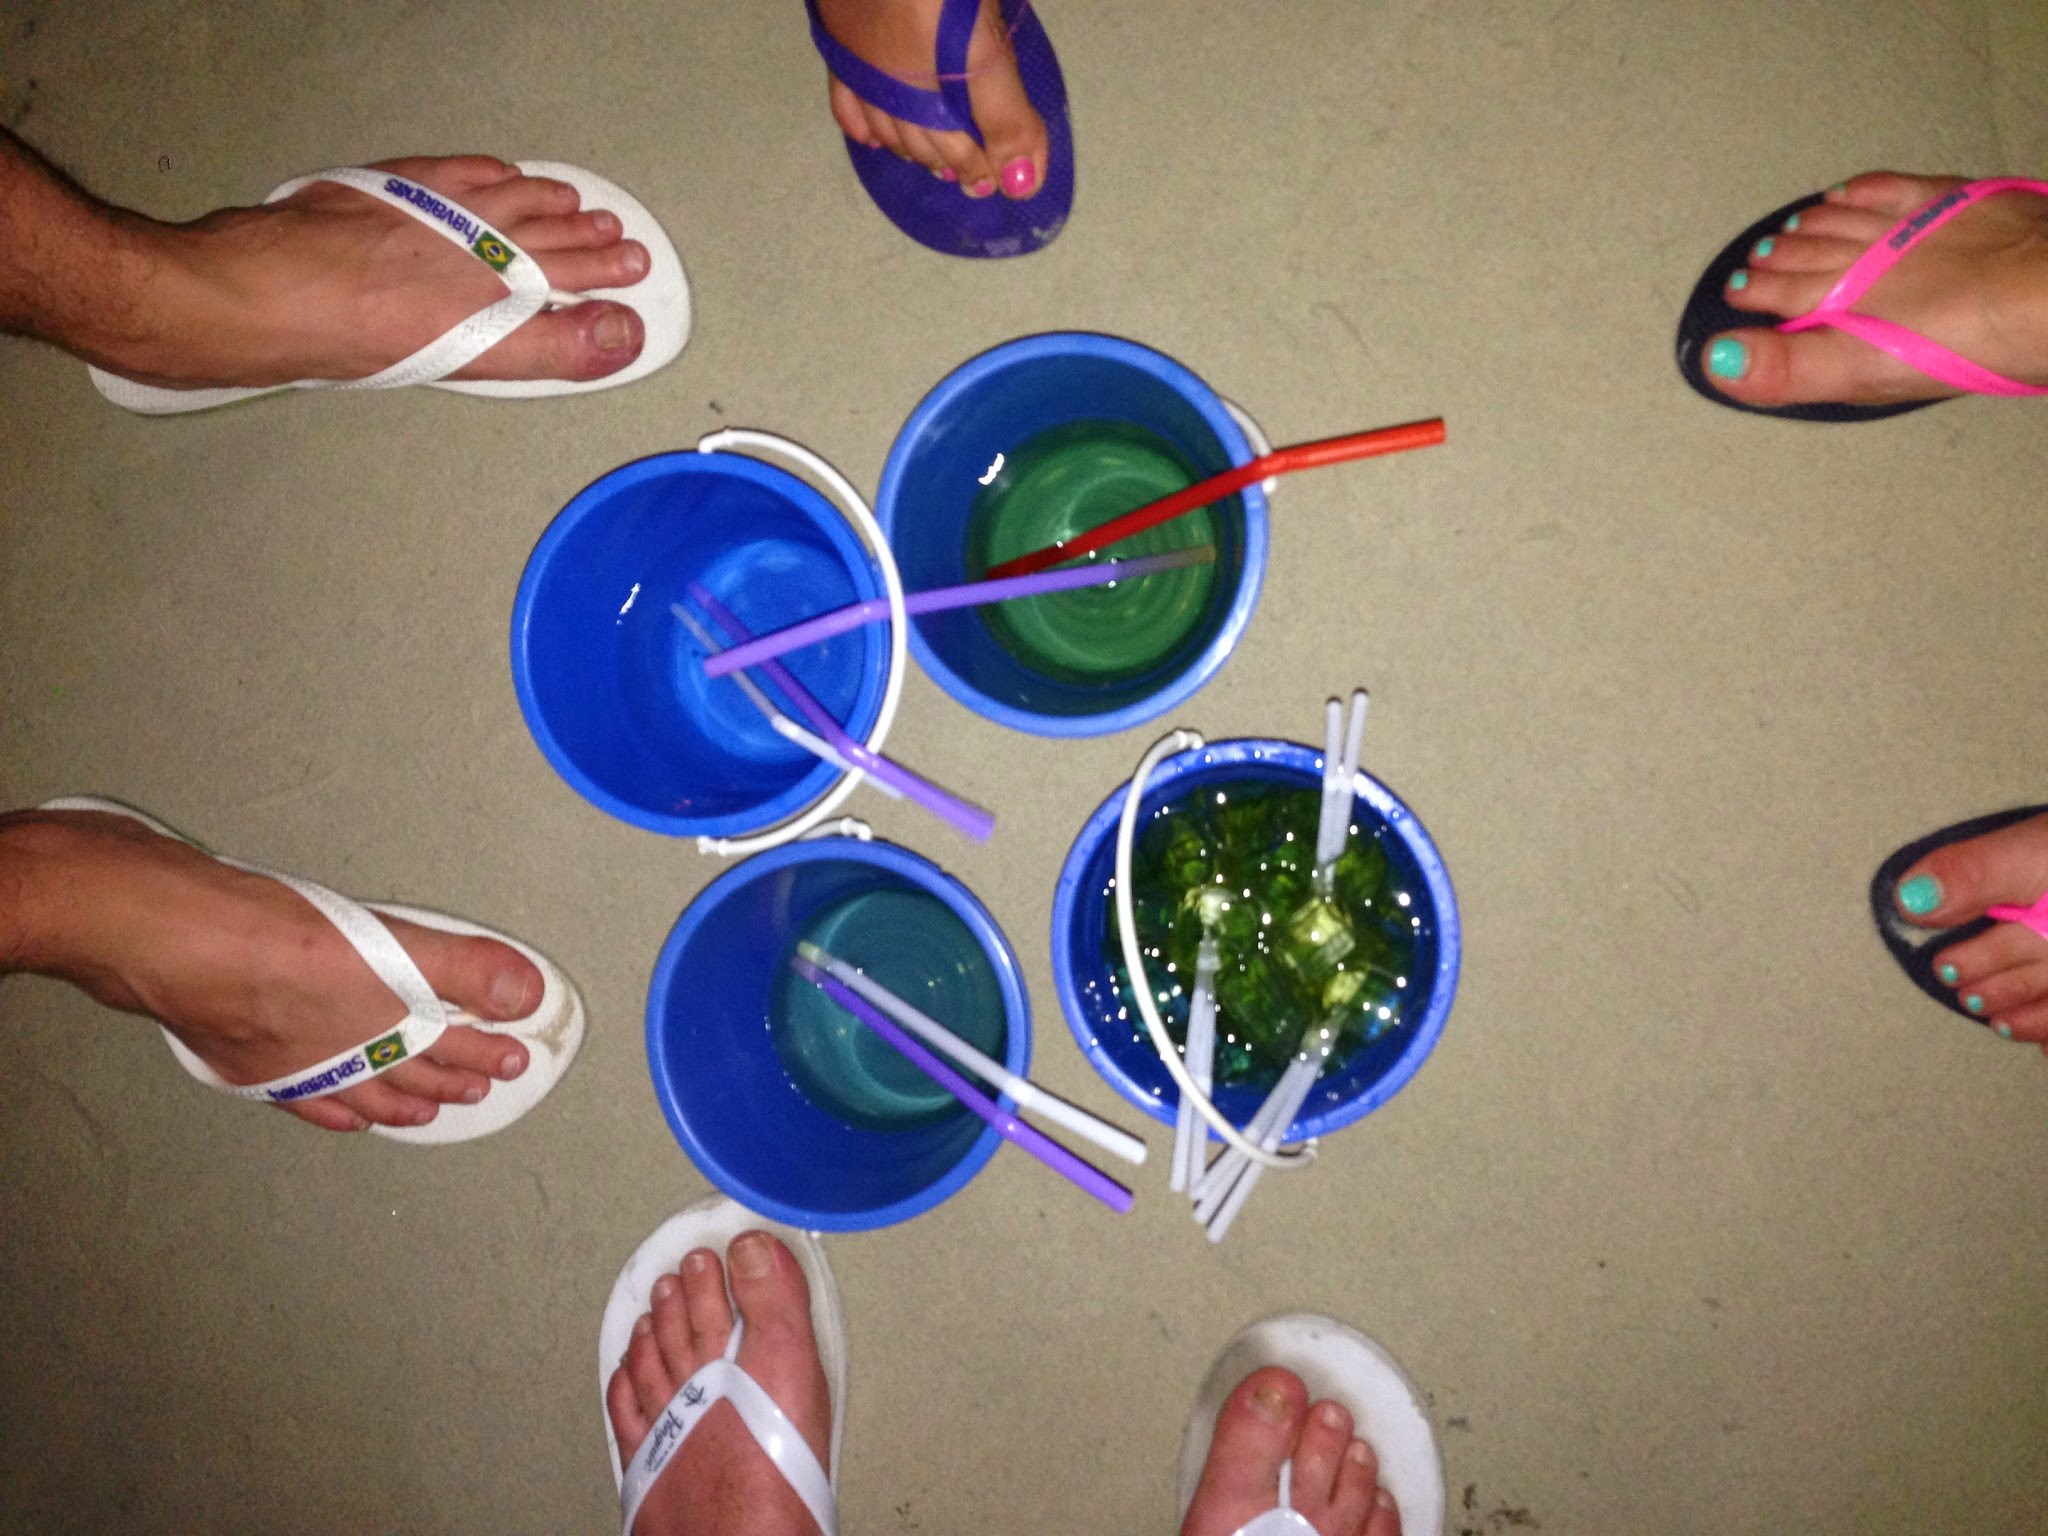 Full moon, buckets, feet, flip flops, sand, beach, koh phangan, full moon party, thailand, travellers, travelling, backpackers, backpacking,